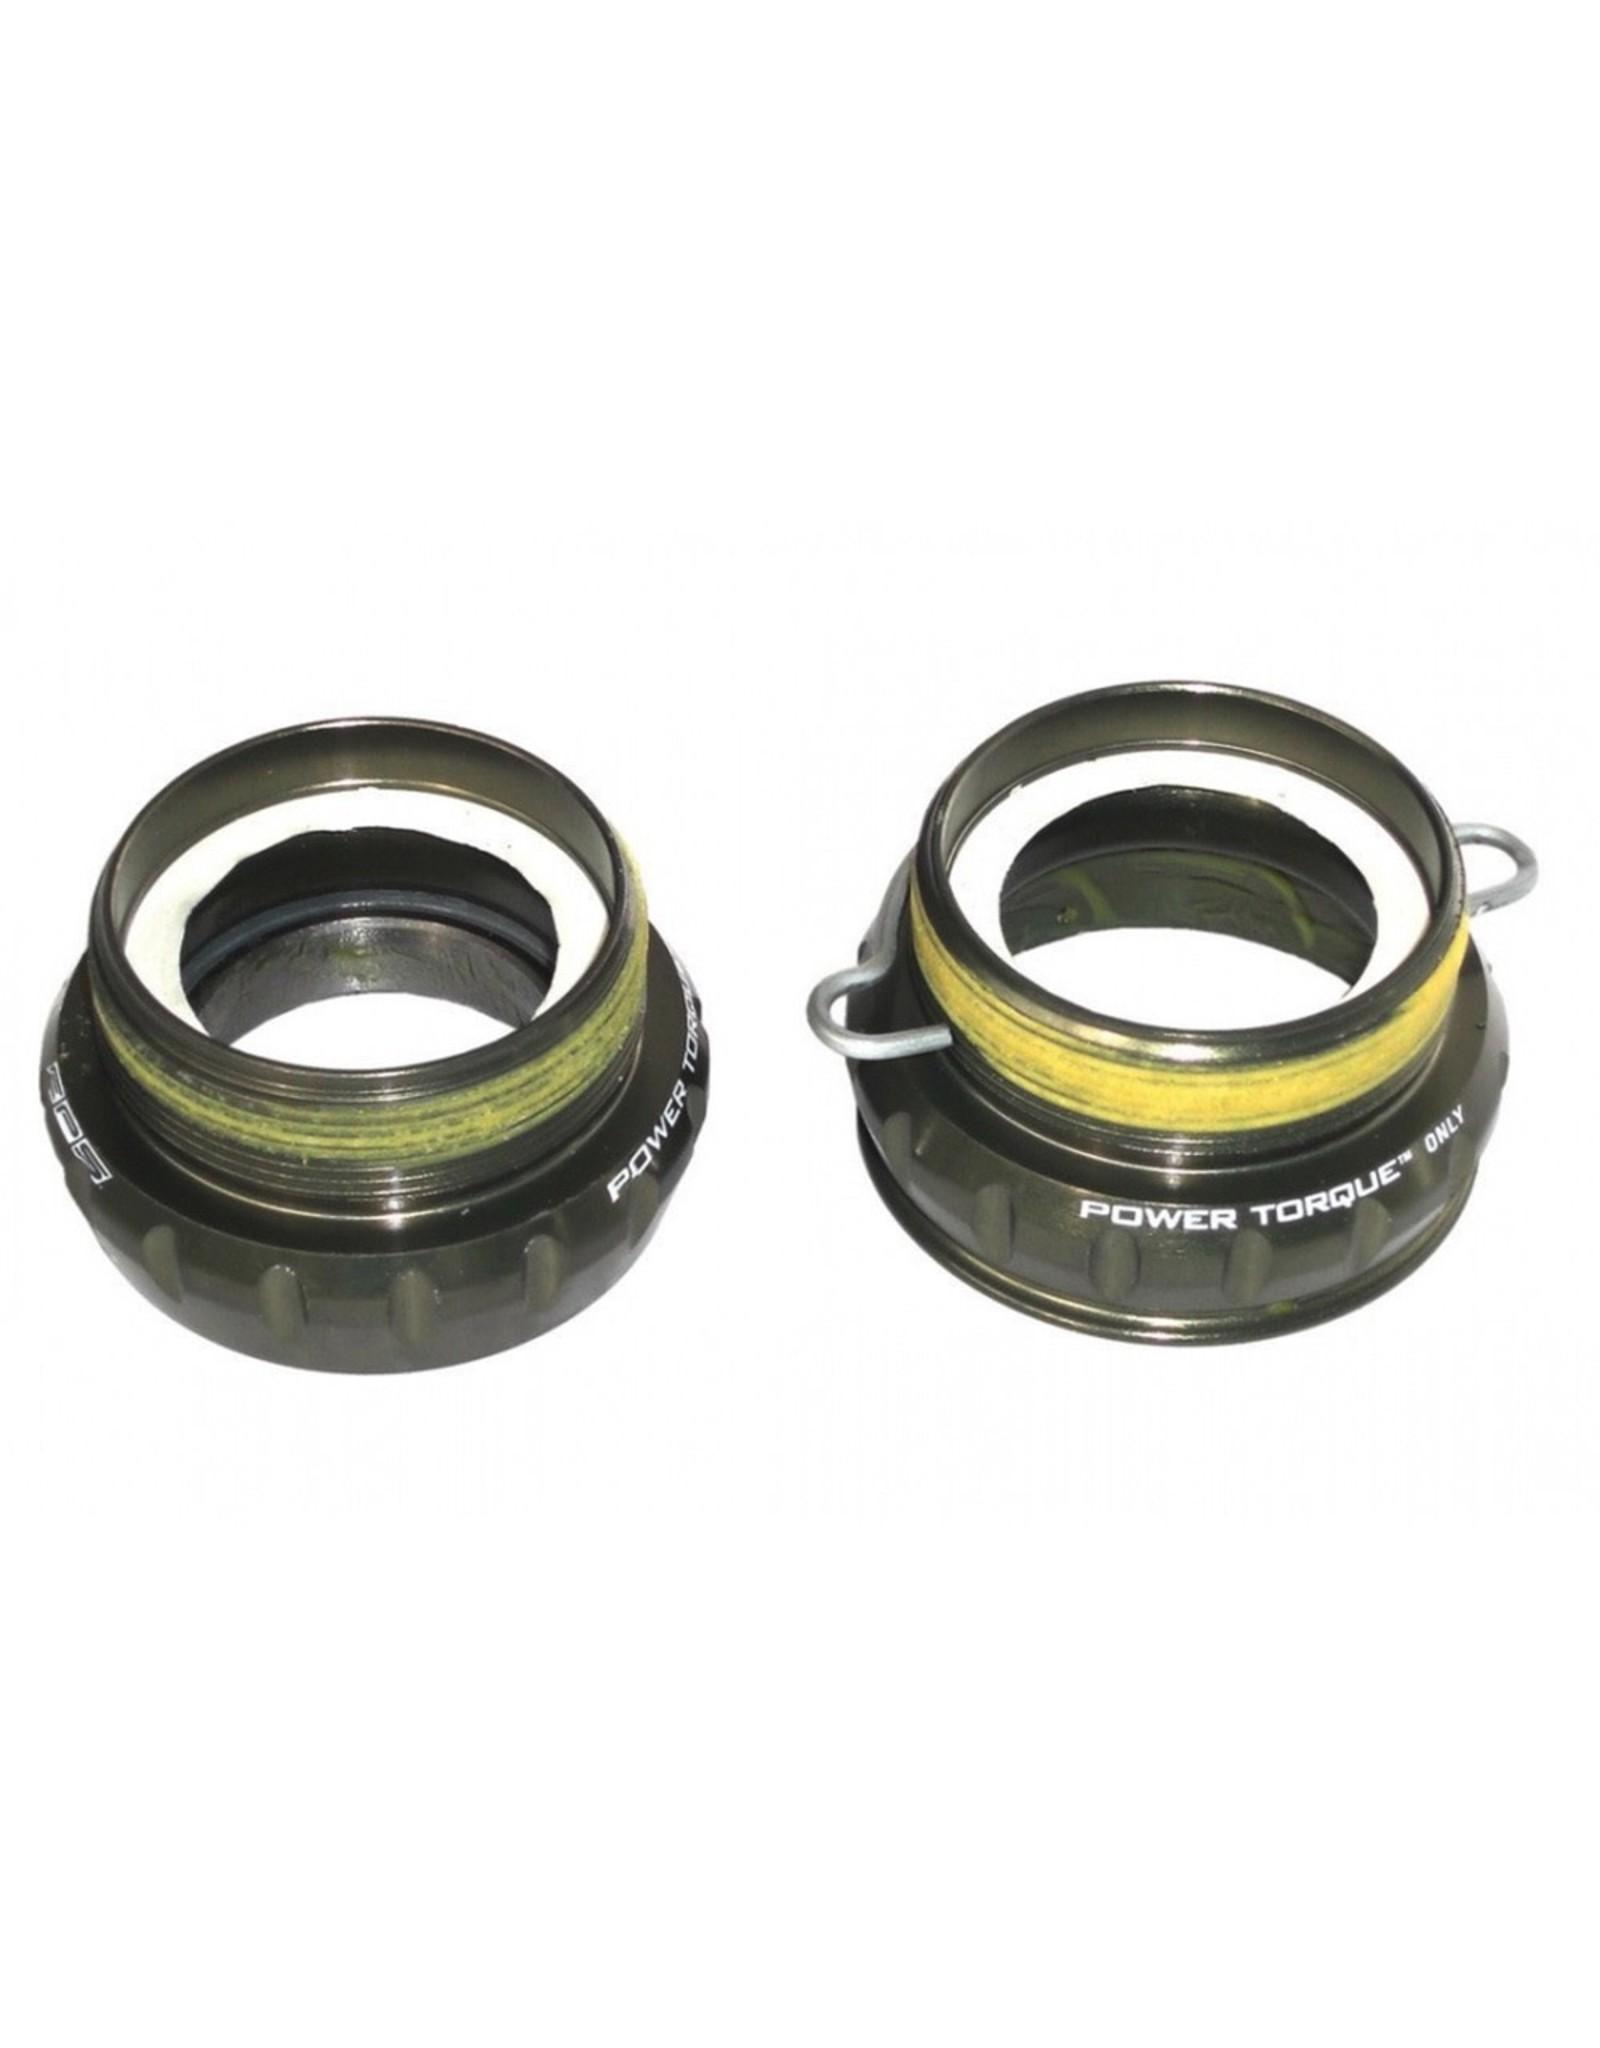 Campagnolo Bottom Bracket Power-Torque Cups